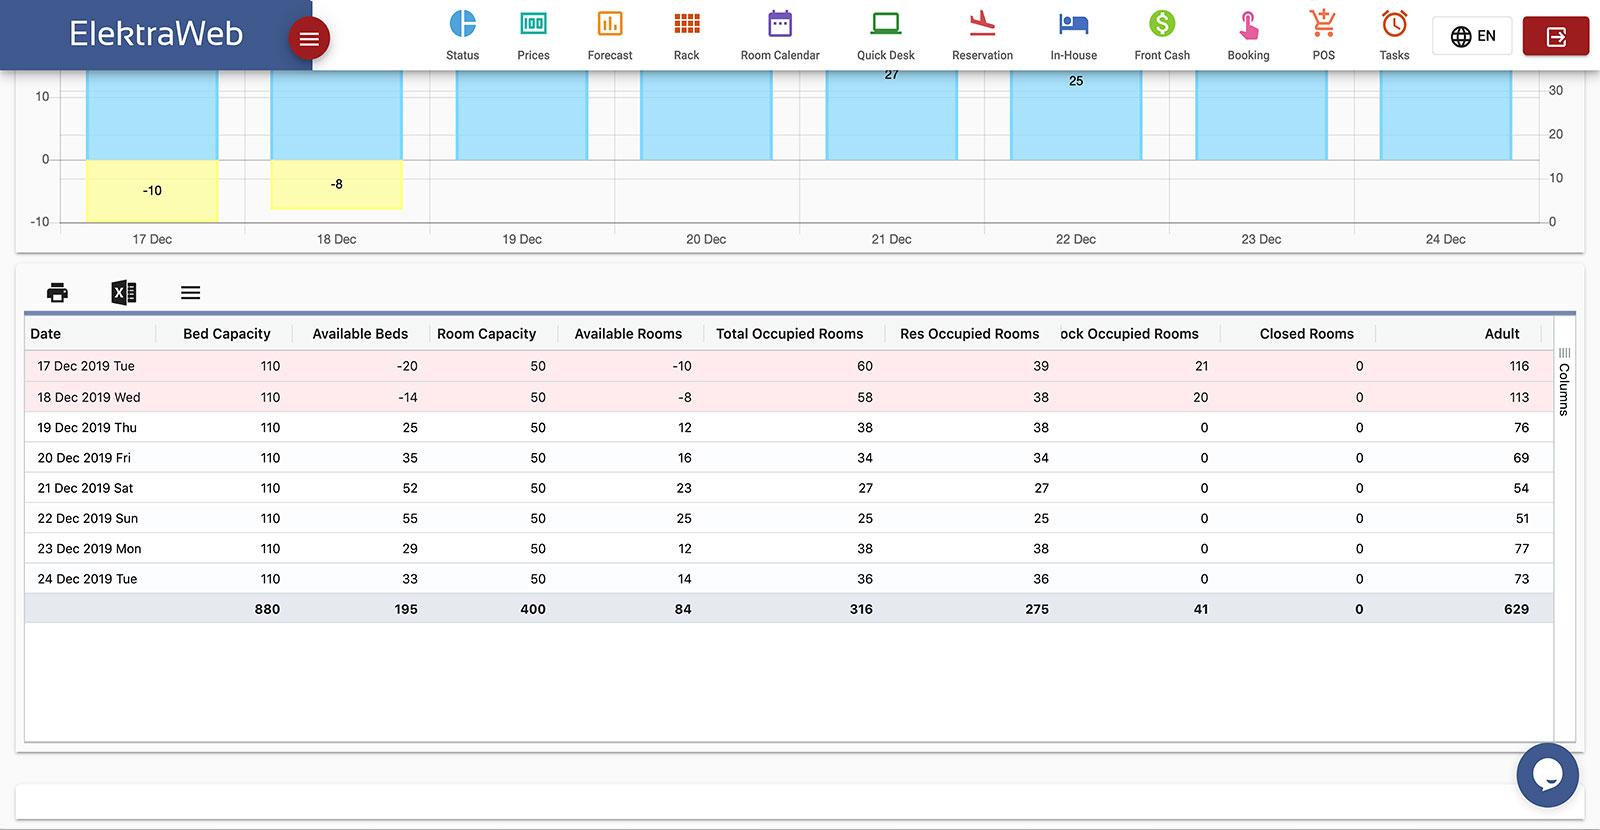 Hotel Program Fully-Featured PMS-Elektraweb Hotel Management System Forecast